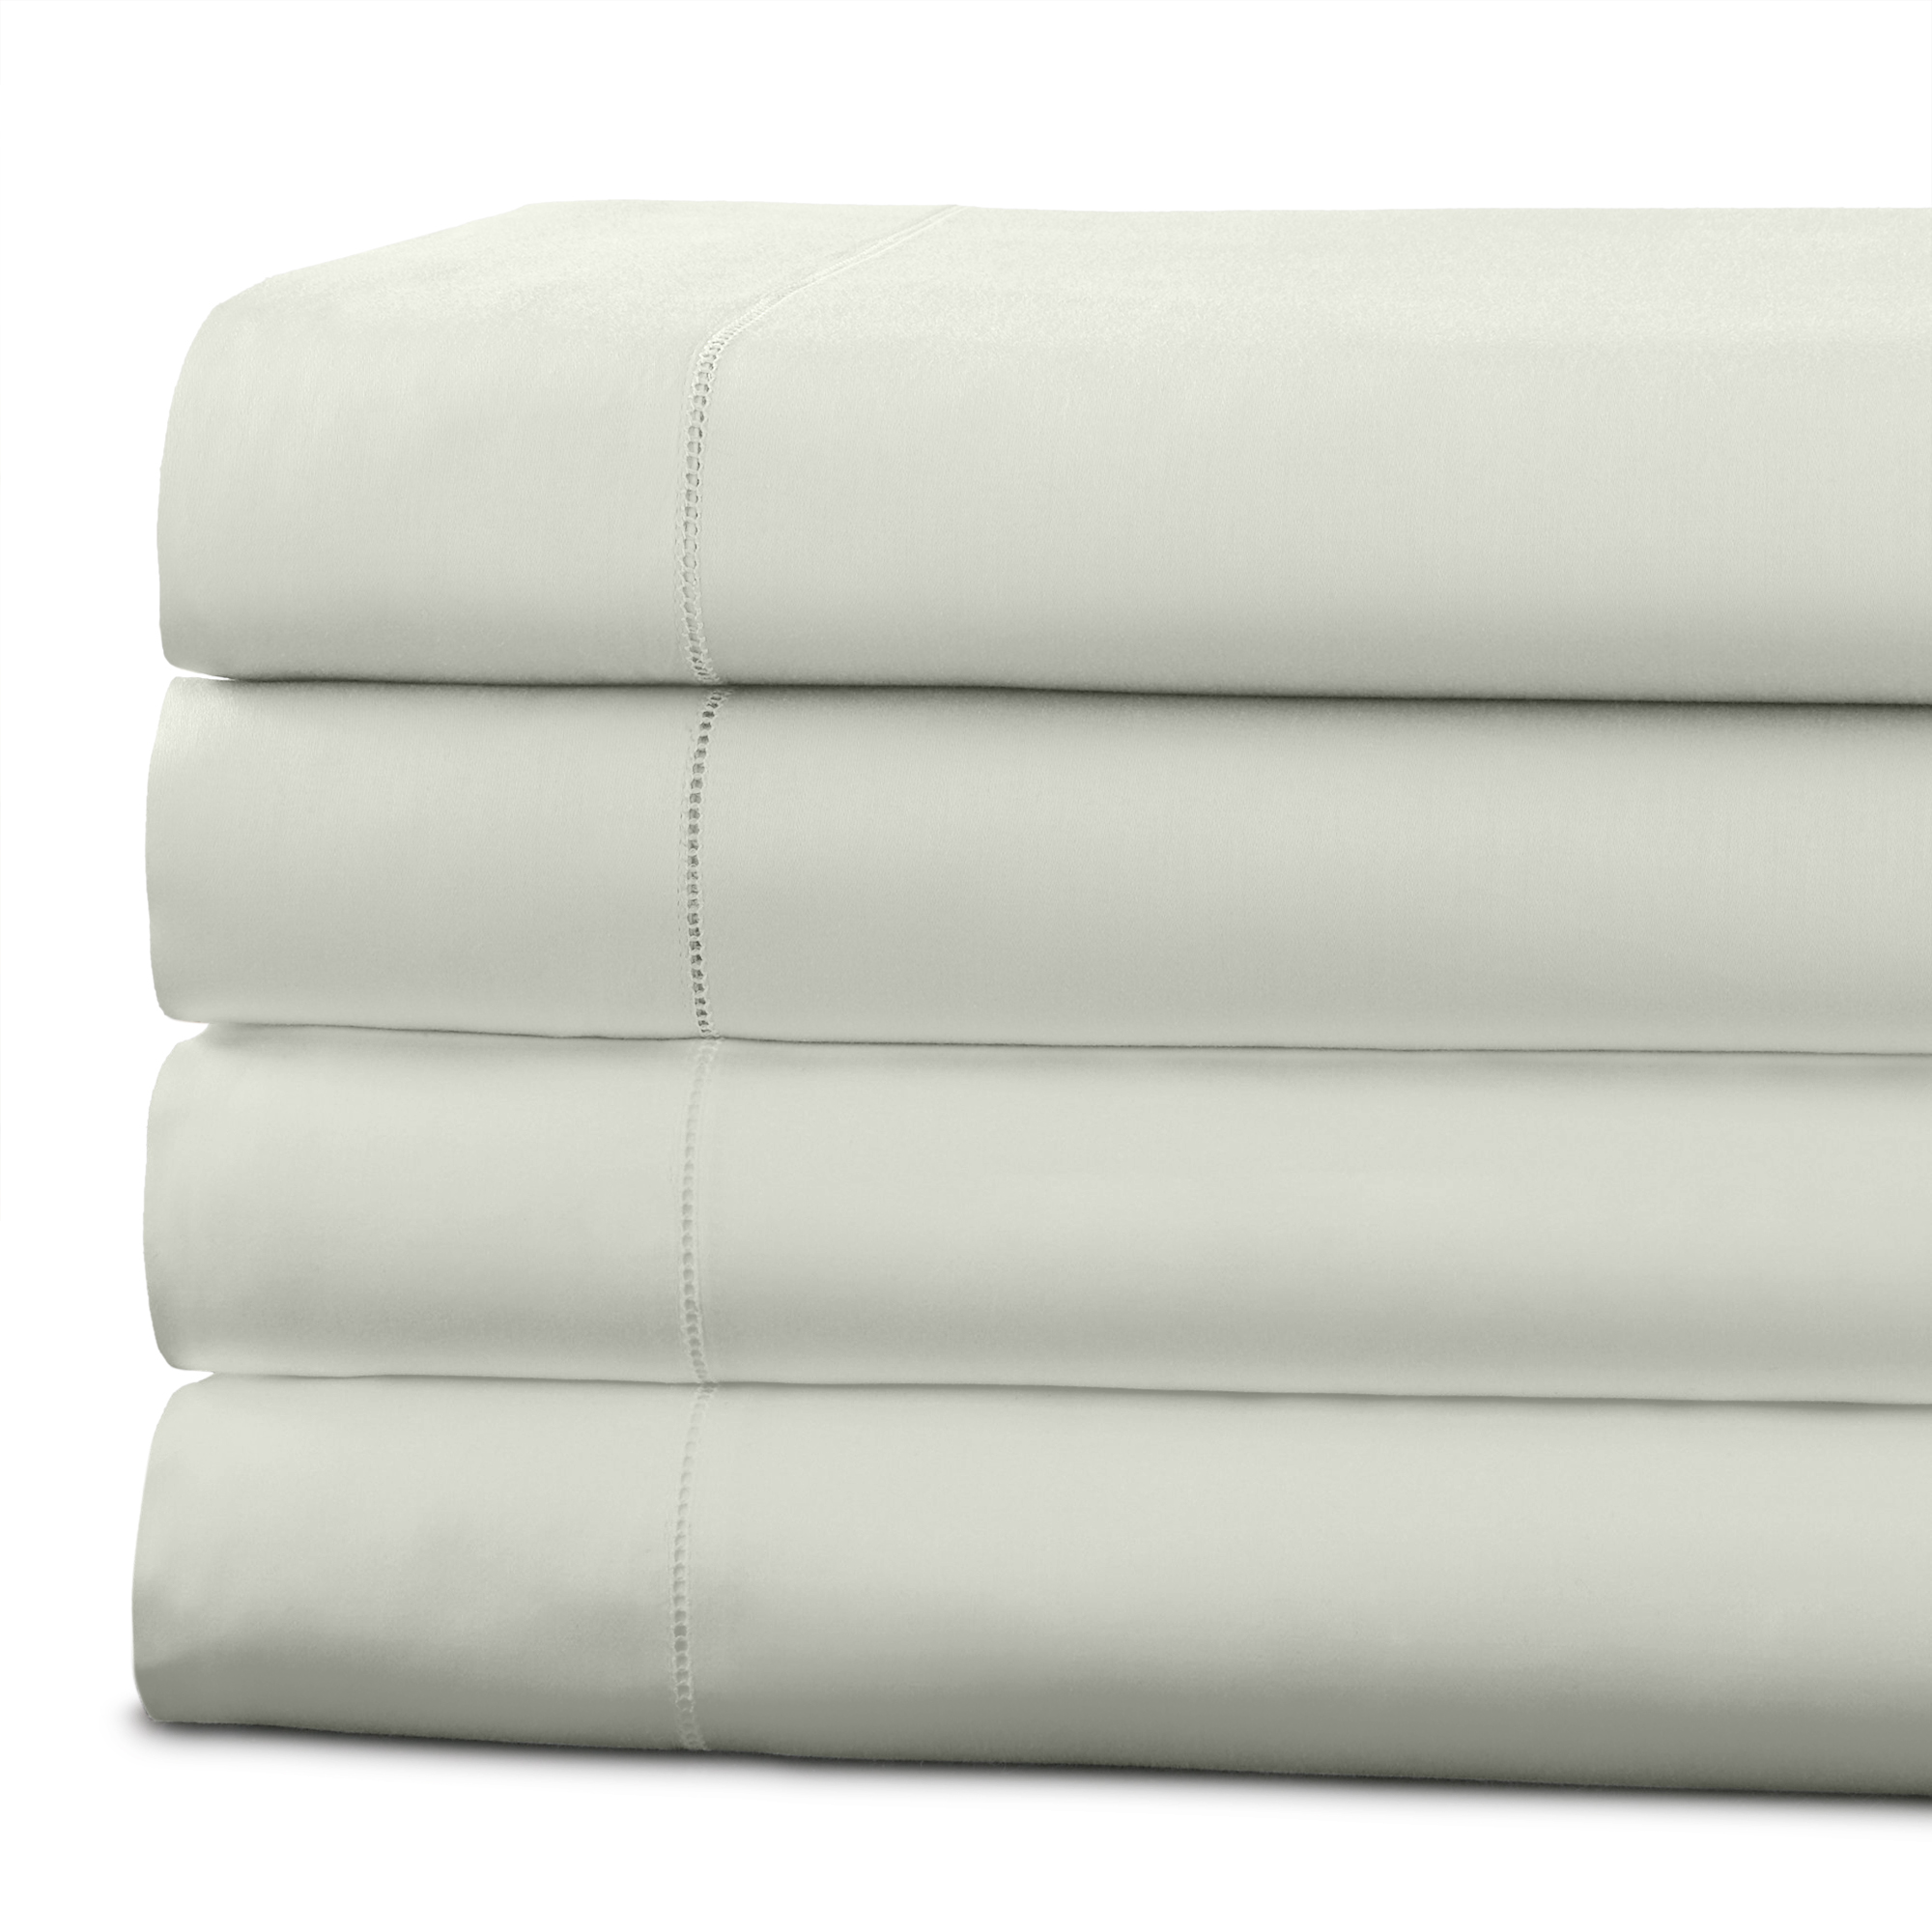 quinn collection 1 000 thread count cotton rich luxury sheet set ebay. Black Bedroom Furniture Sets. Home Design Ideas